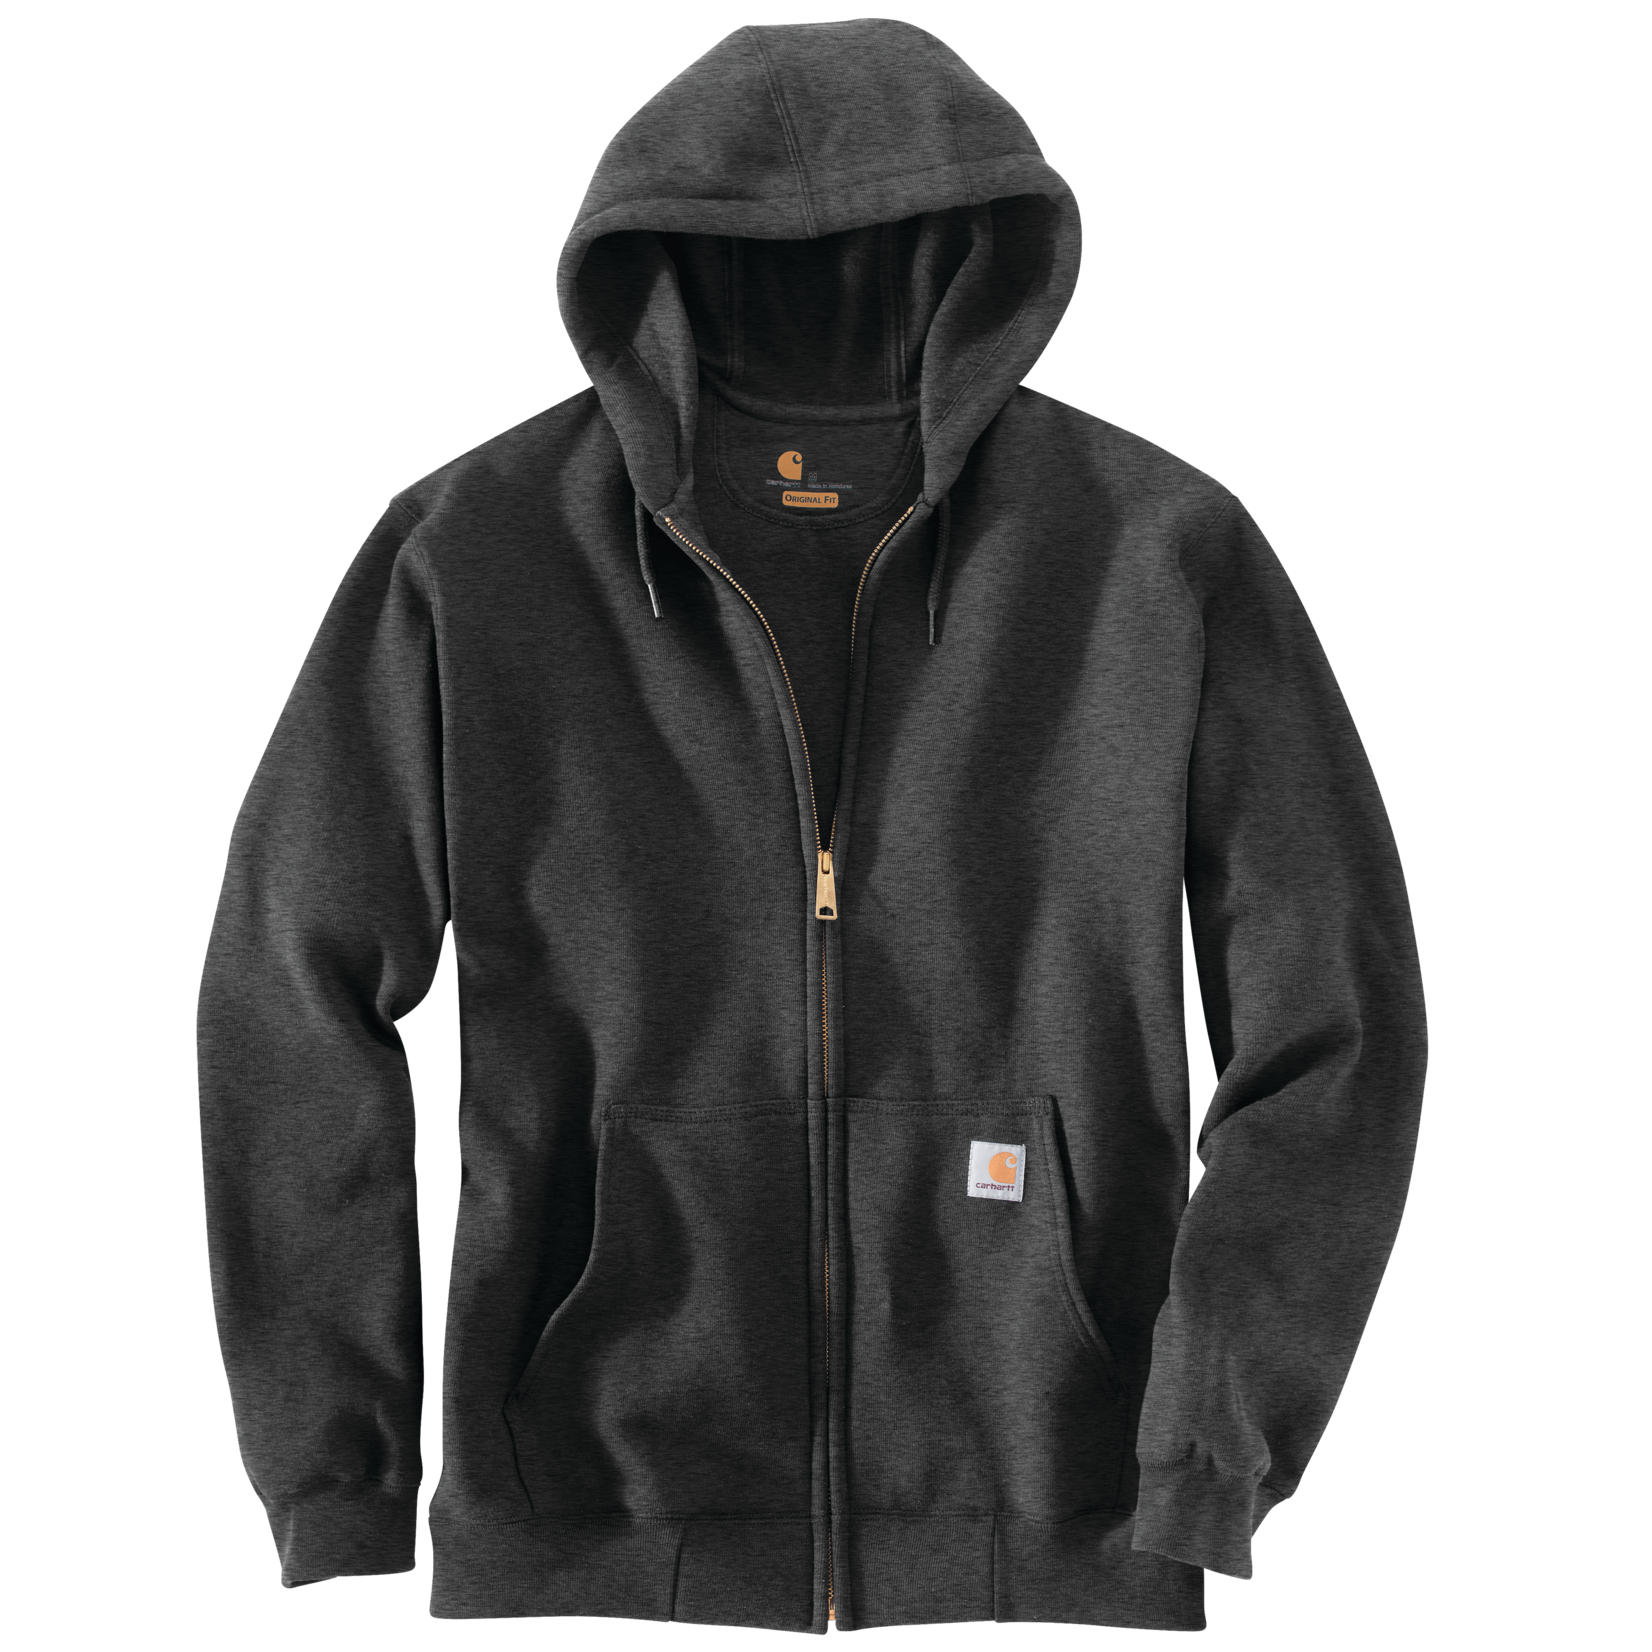 Carhartt Carhartt K122 Loose-Fit Midweight Full-Zip Hooded Sweatshirt - 026 Carbon Heather